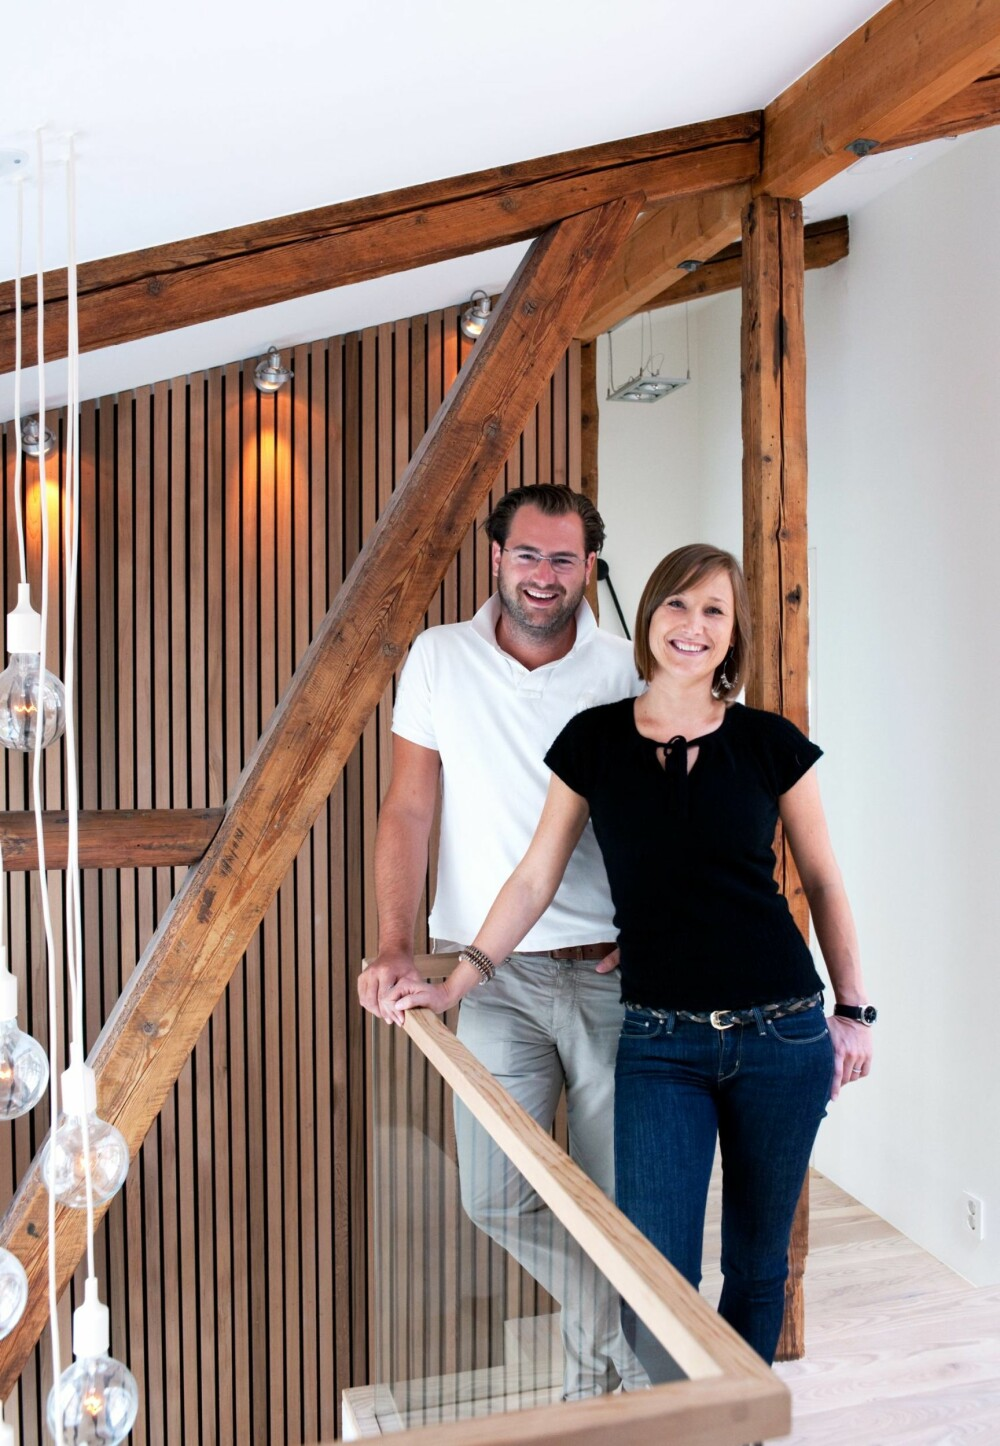 ARKITEKTPARTNERE: Christian Fredrik Morgenstierne og Johanne Taugbøl er partnere i firmaet Wood A+D.